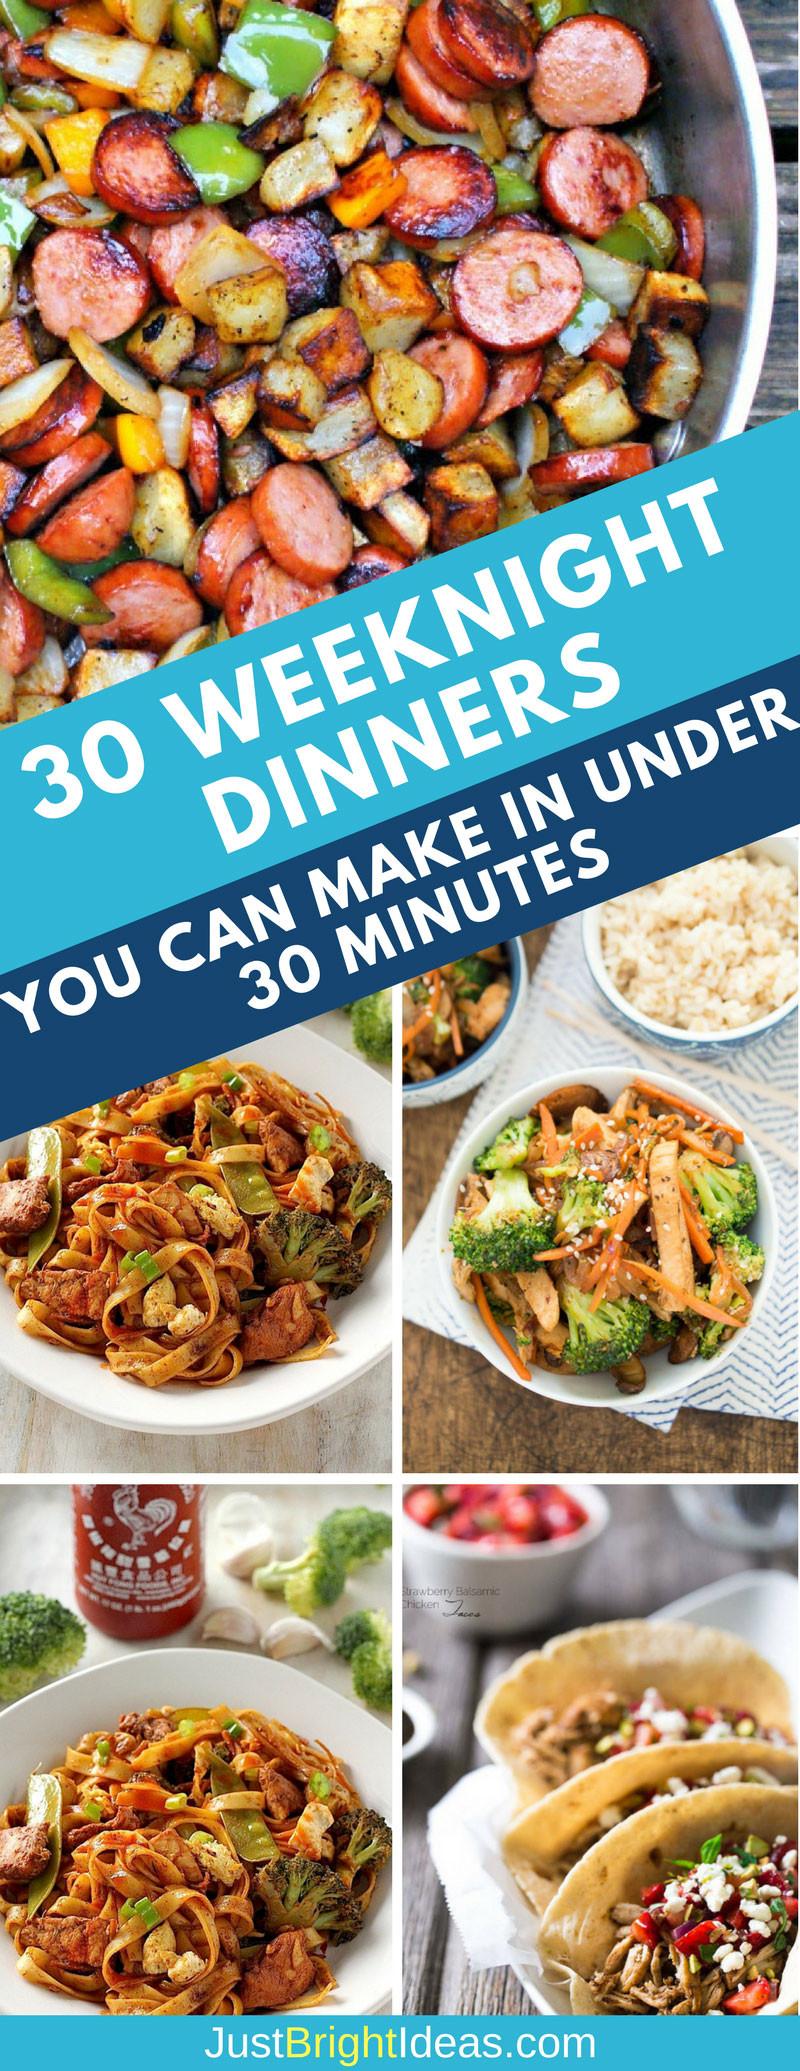 30 Minute Dinners  Best 30 Minute Dinner Recipes Easy Midweek Meals